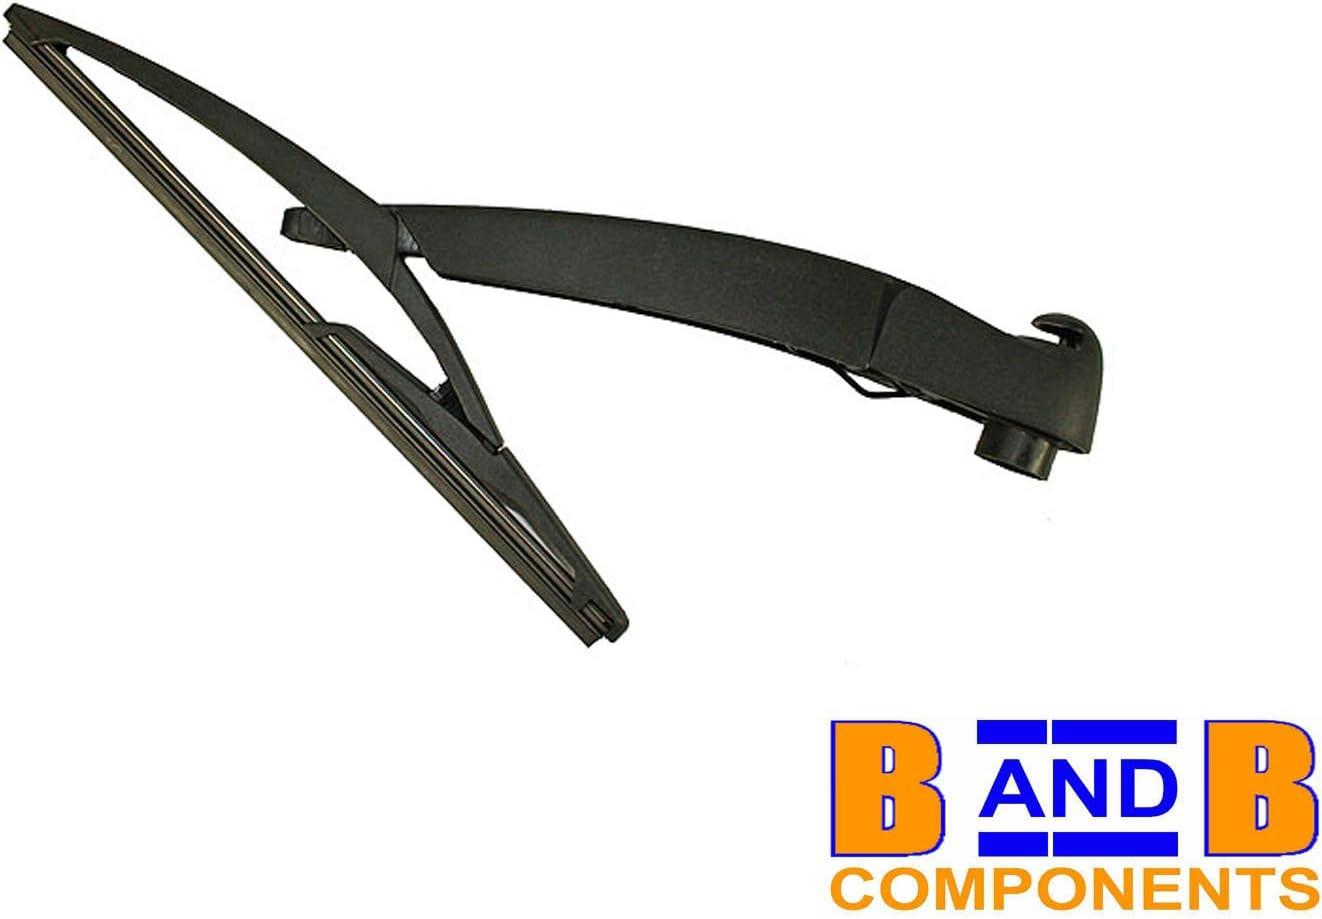 Windshield Wiper Arm Washer Rear Fits MINI Cooper S Jcw One D Works 2001-2006